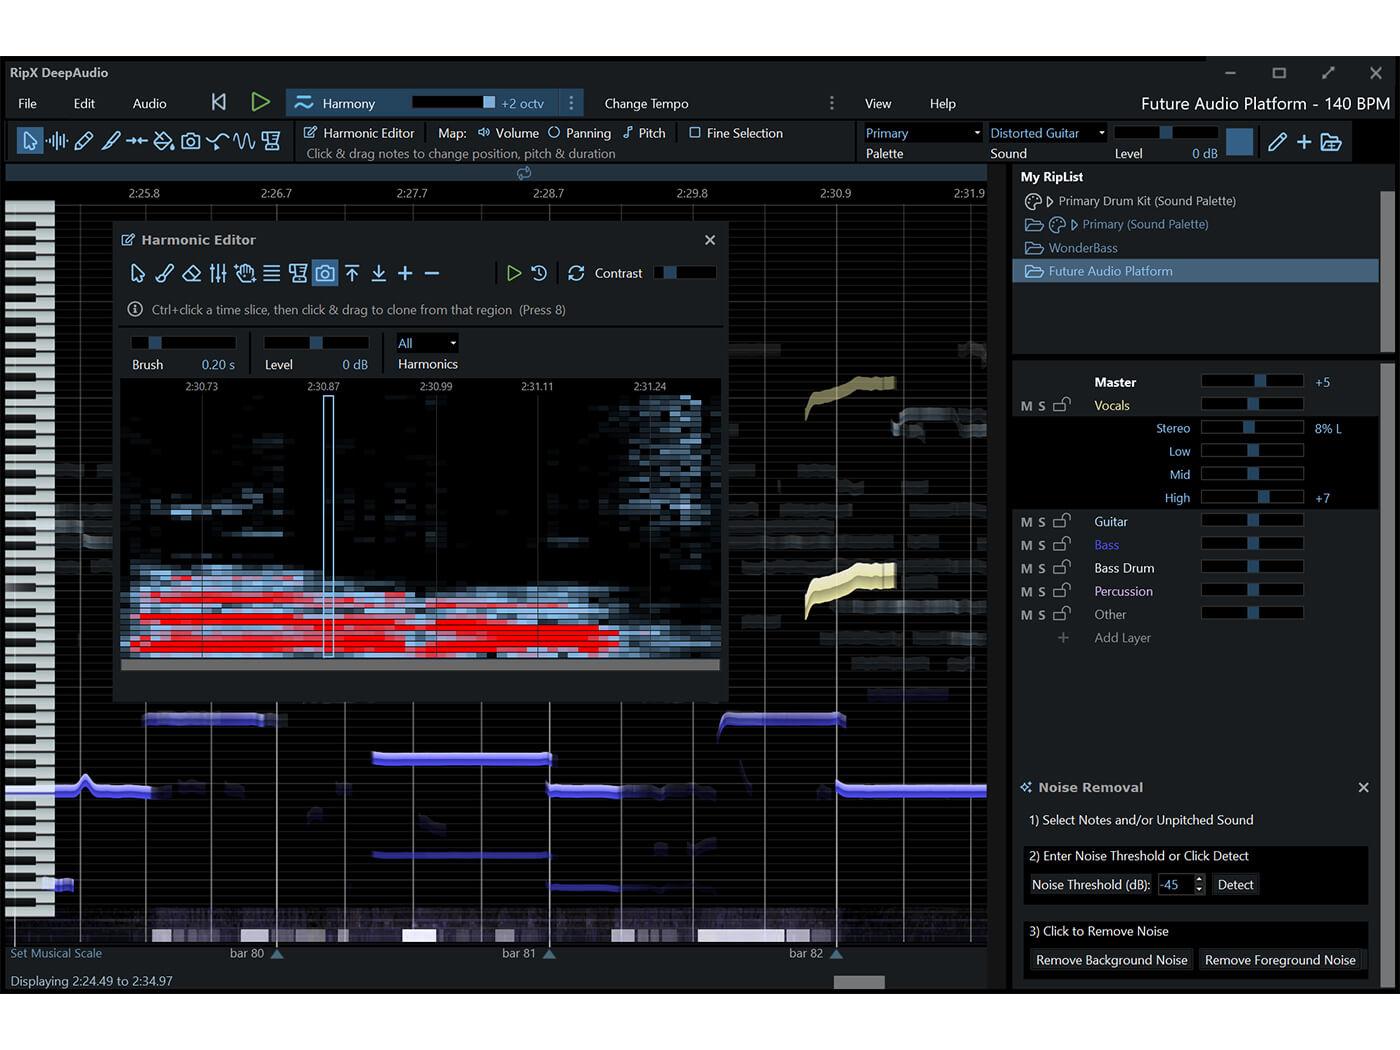 Hitnmix DeepAudio